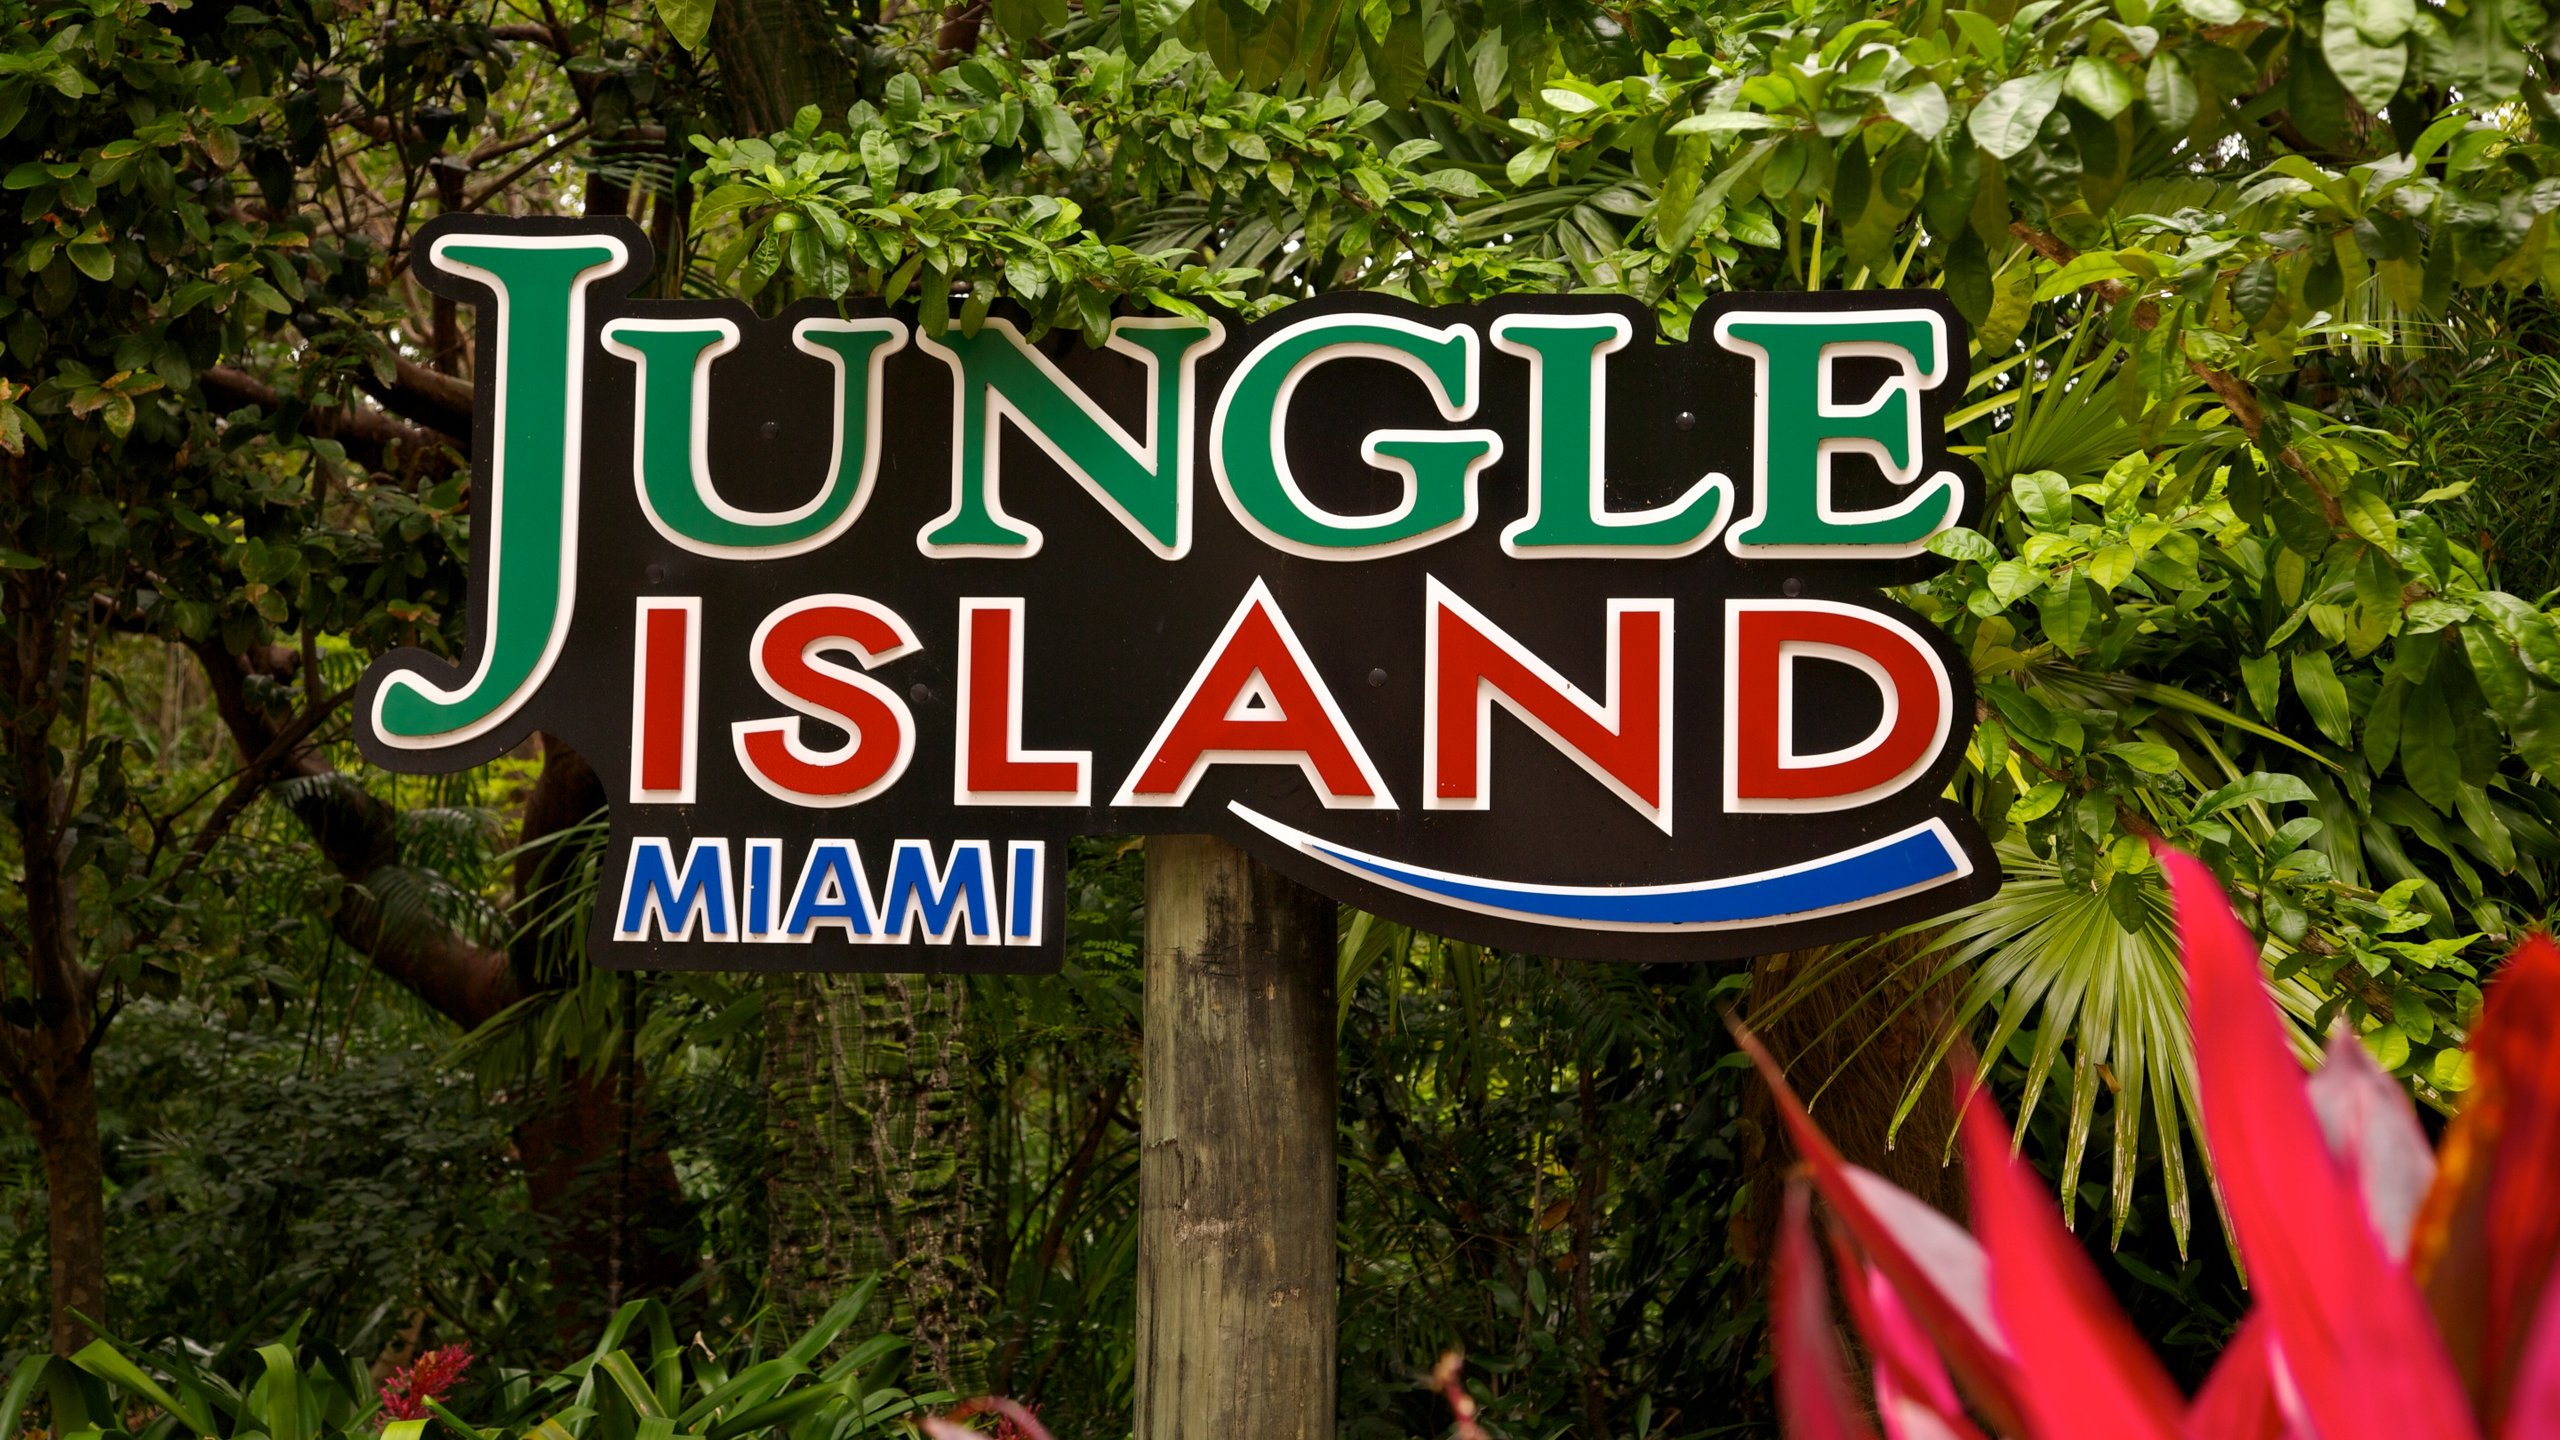 Jungle Island, Miami Beach, Florida, USA